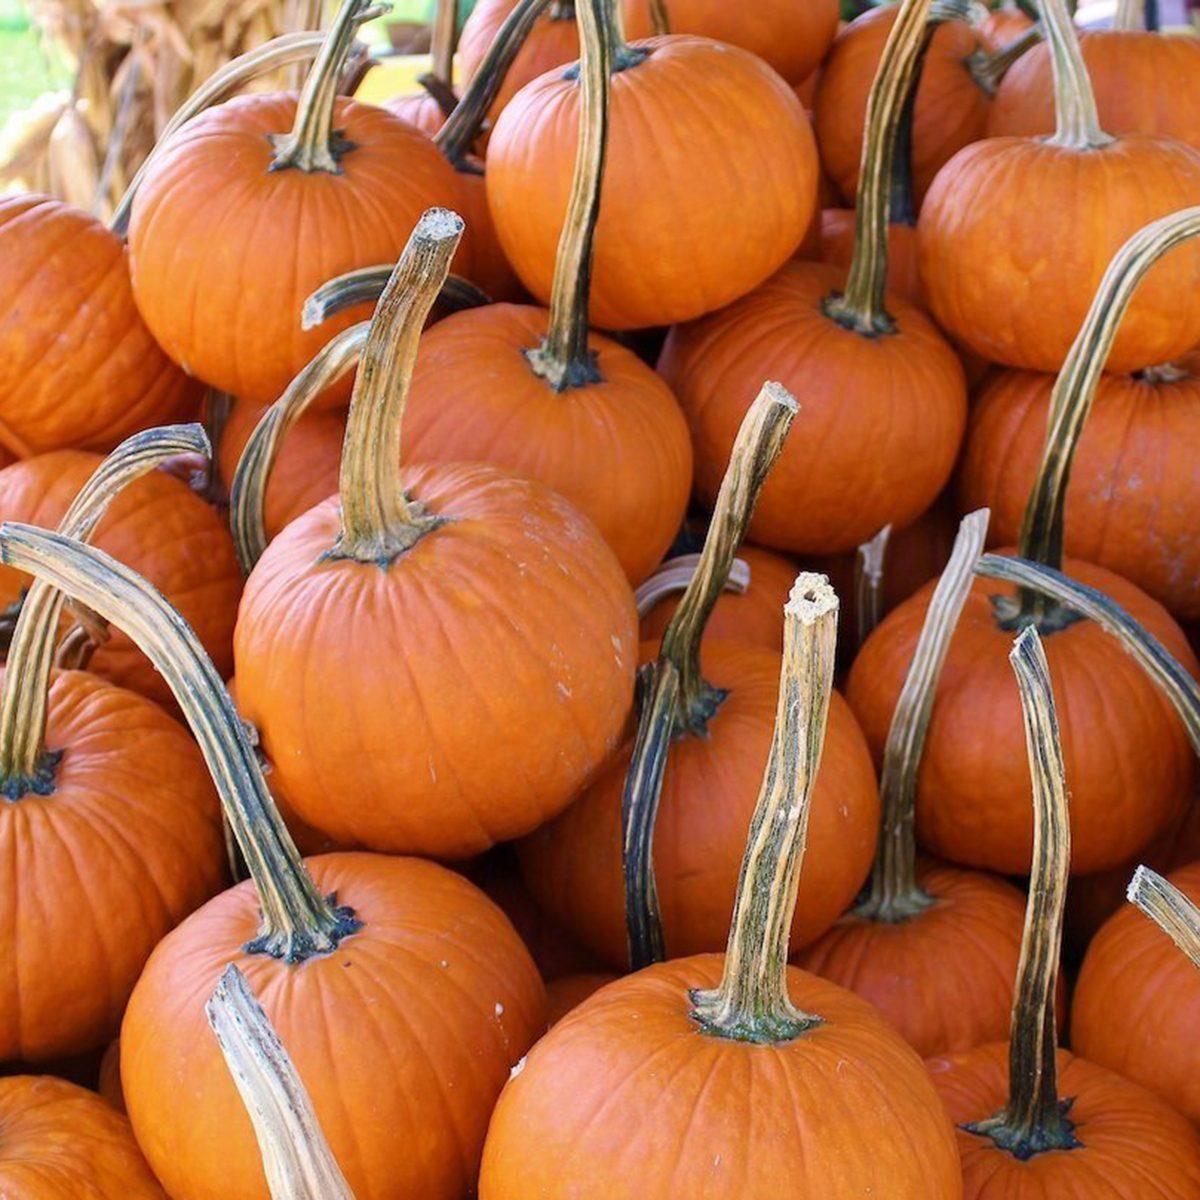 Mound of pumpkins